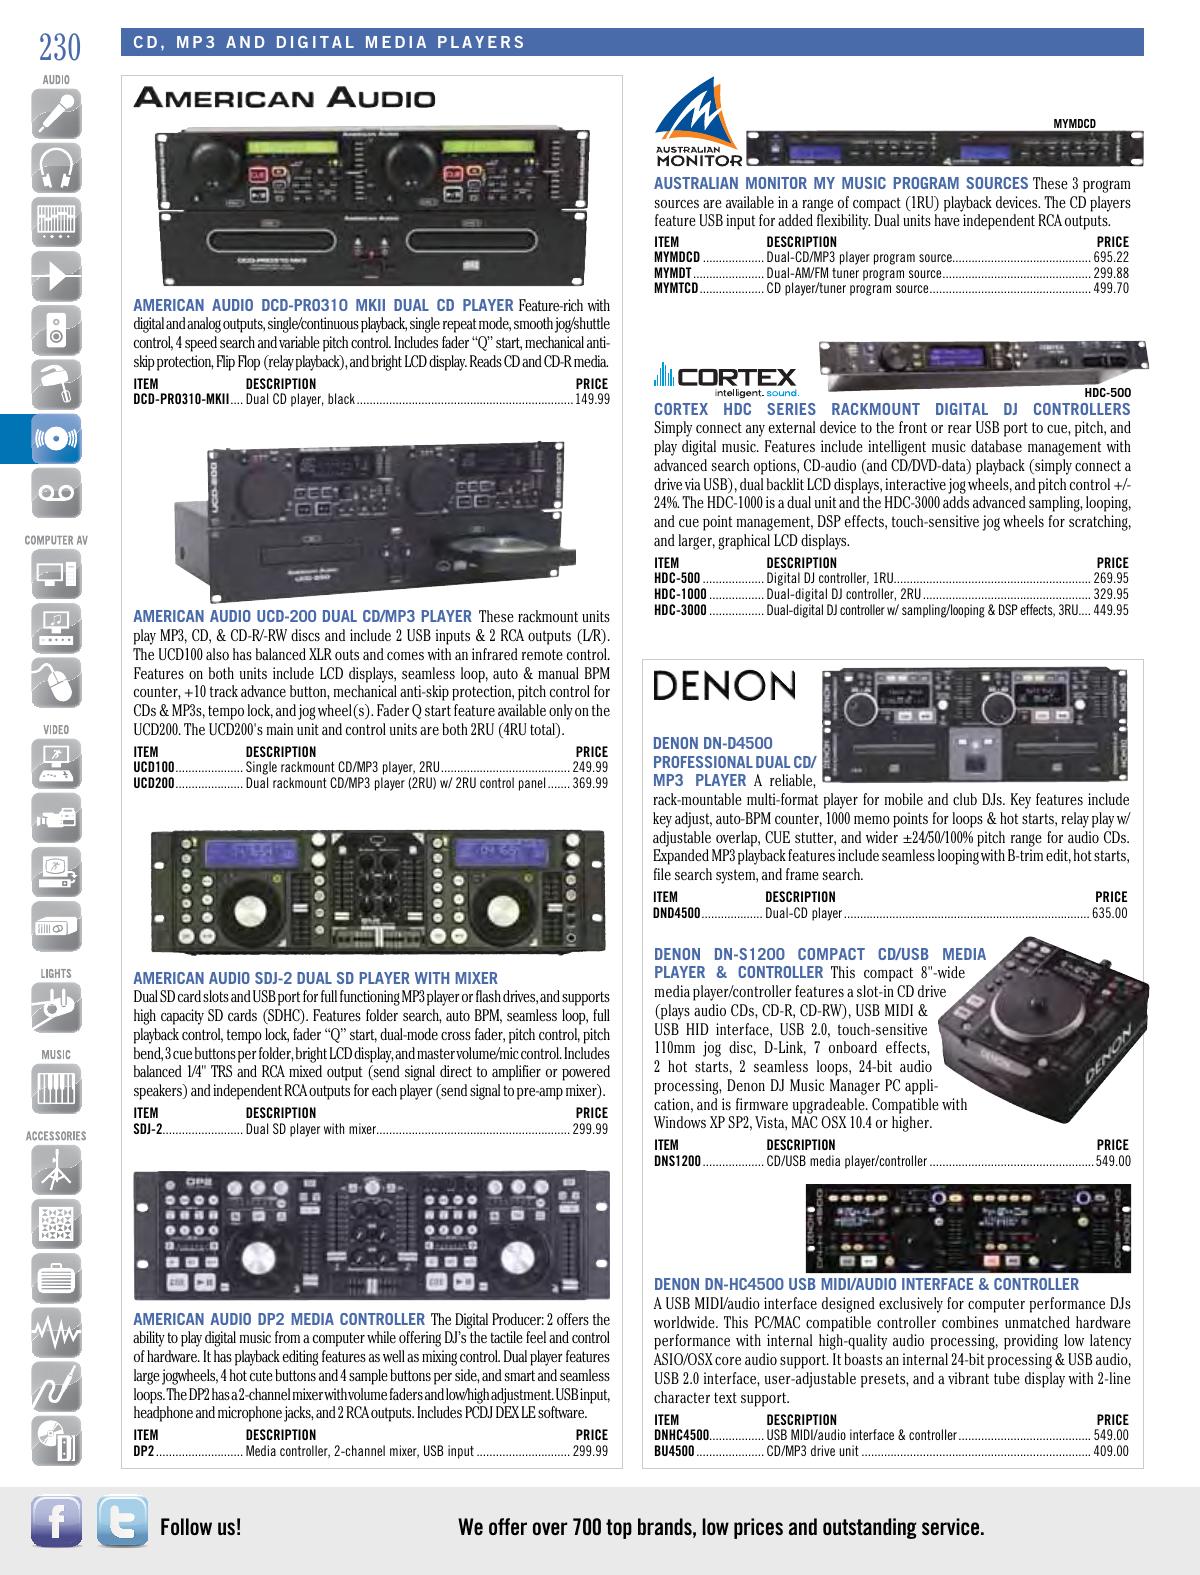 American Dj Supply Ucd200 Dual Cd Mp3 Player With Usb Inputs